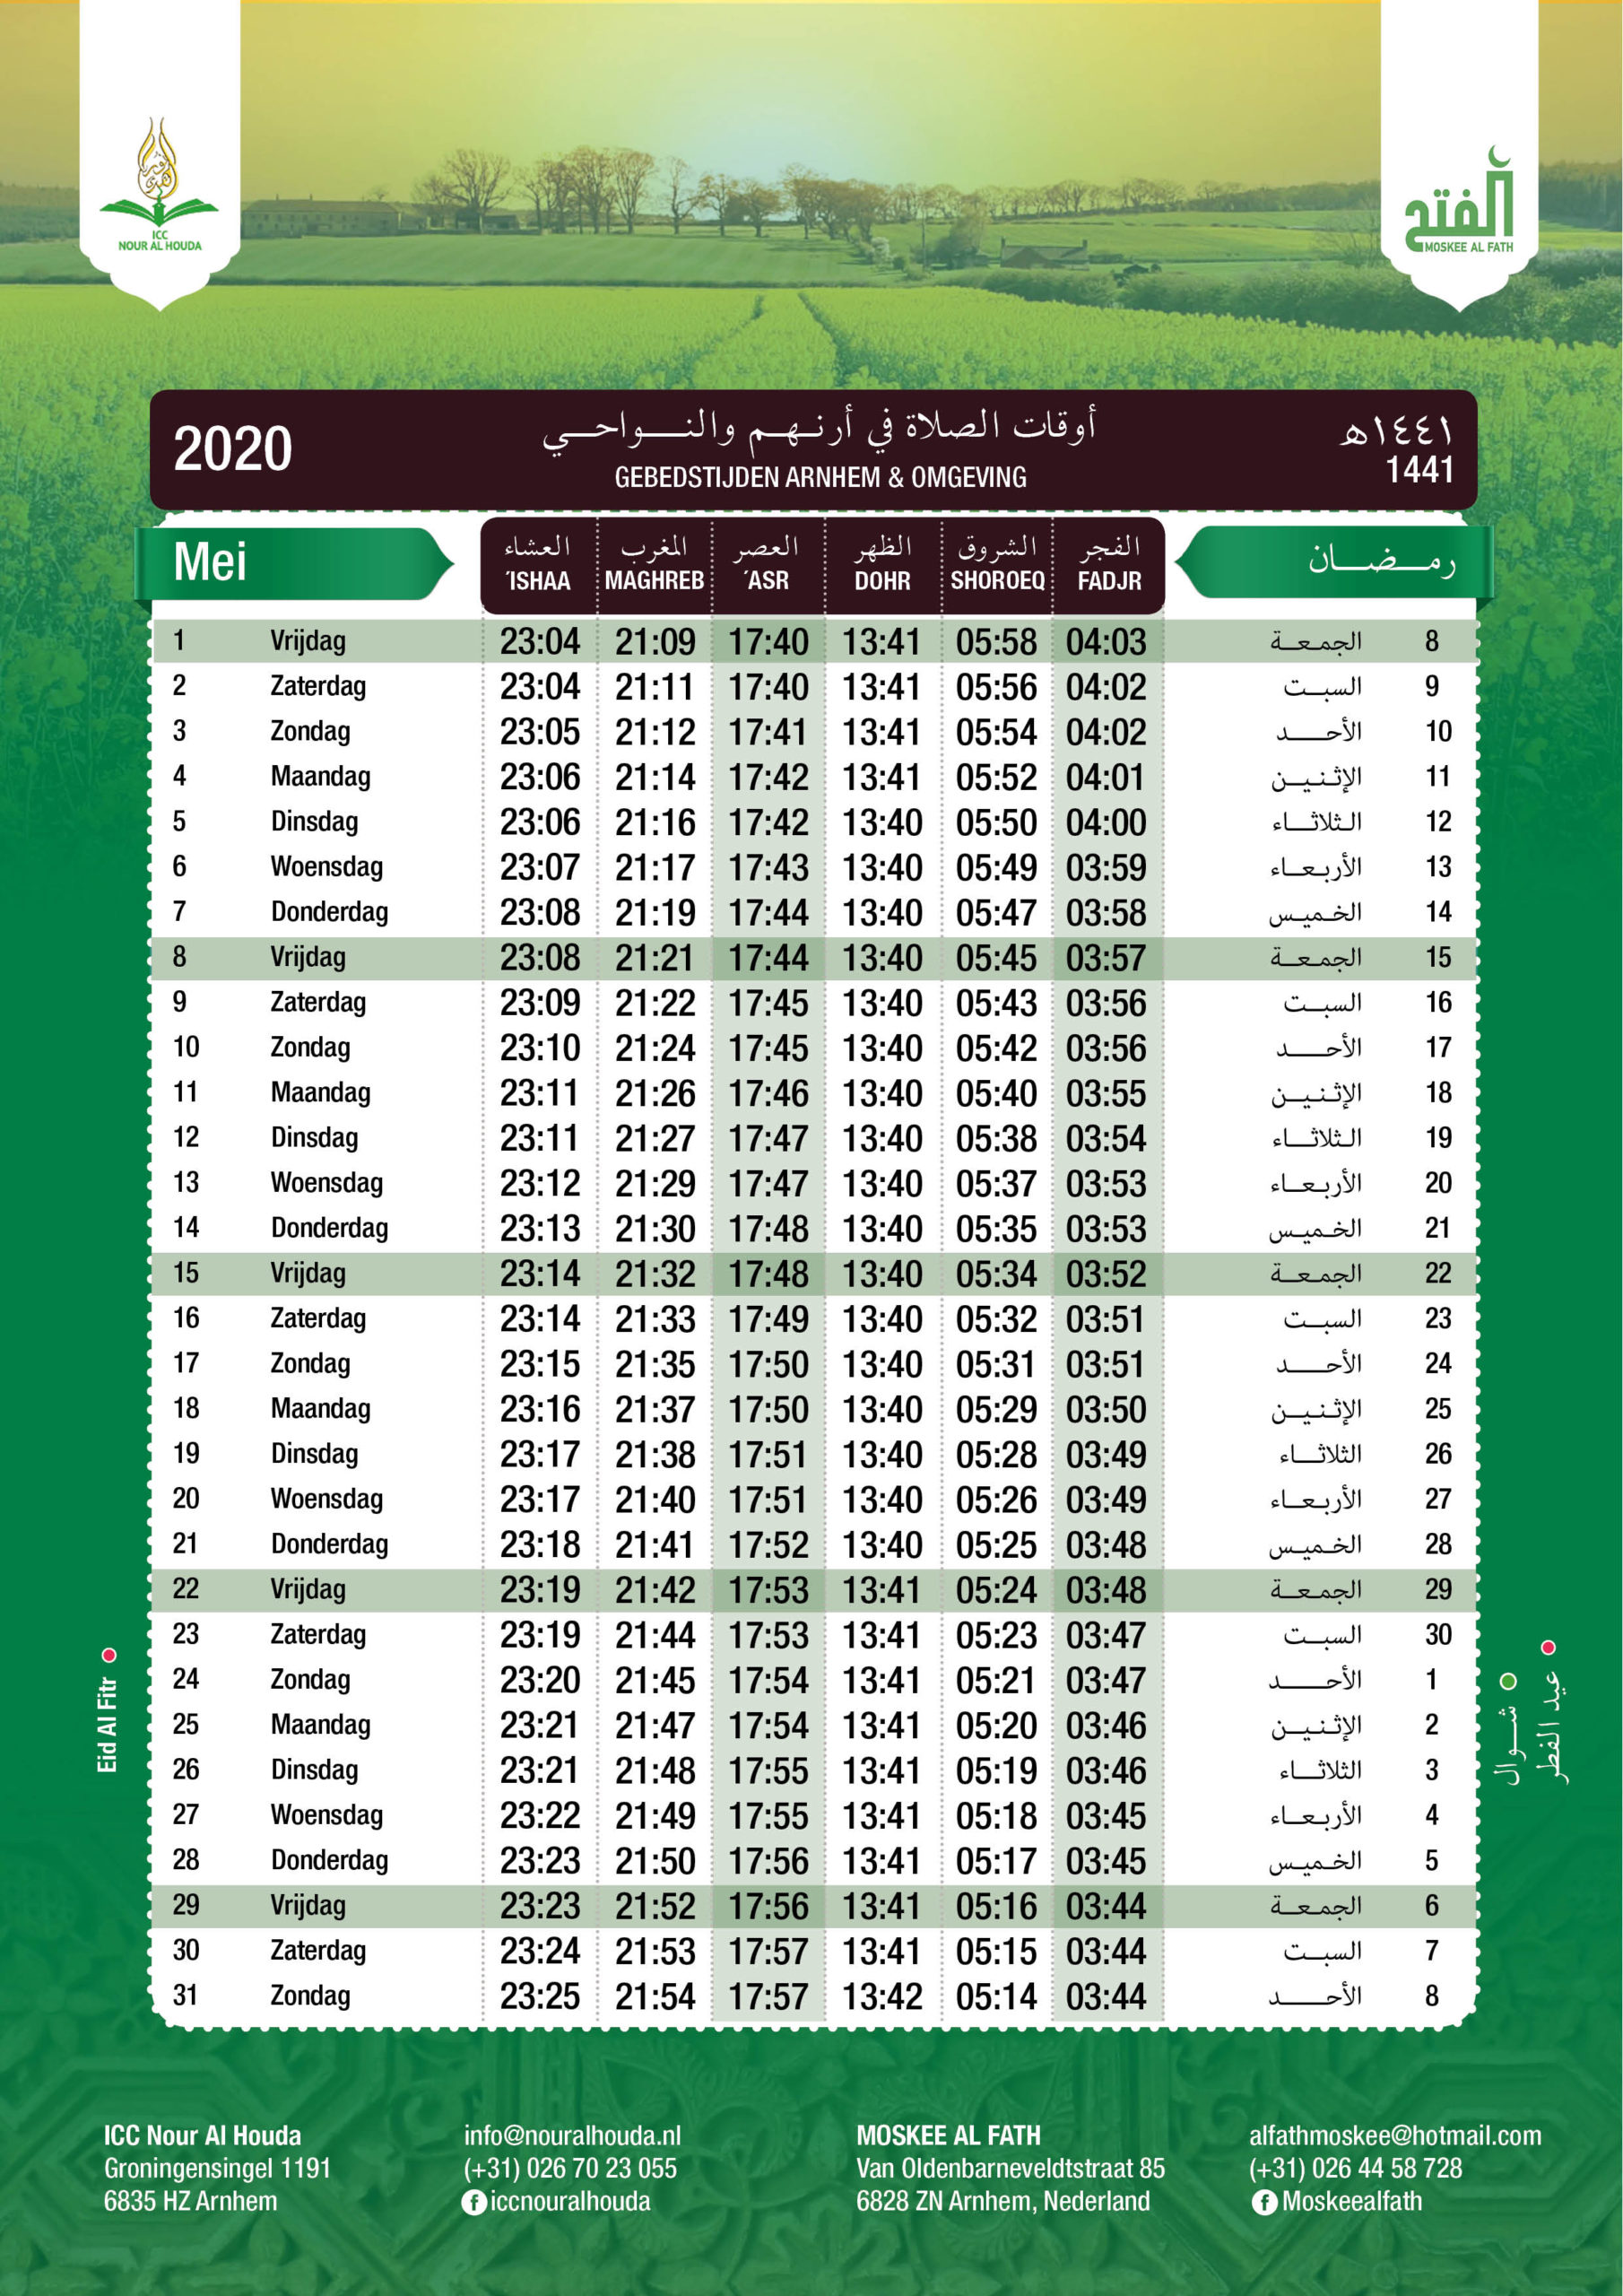 Gebedstijden mei 2020 Arnhem Moskee Al Fath